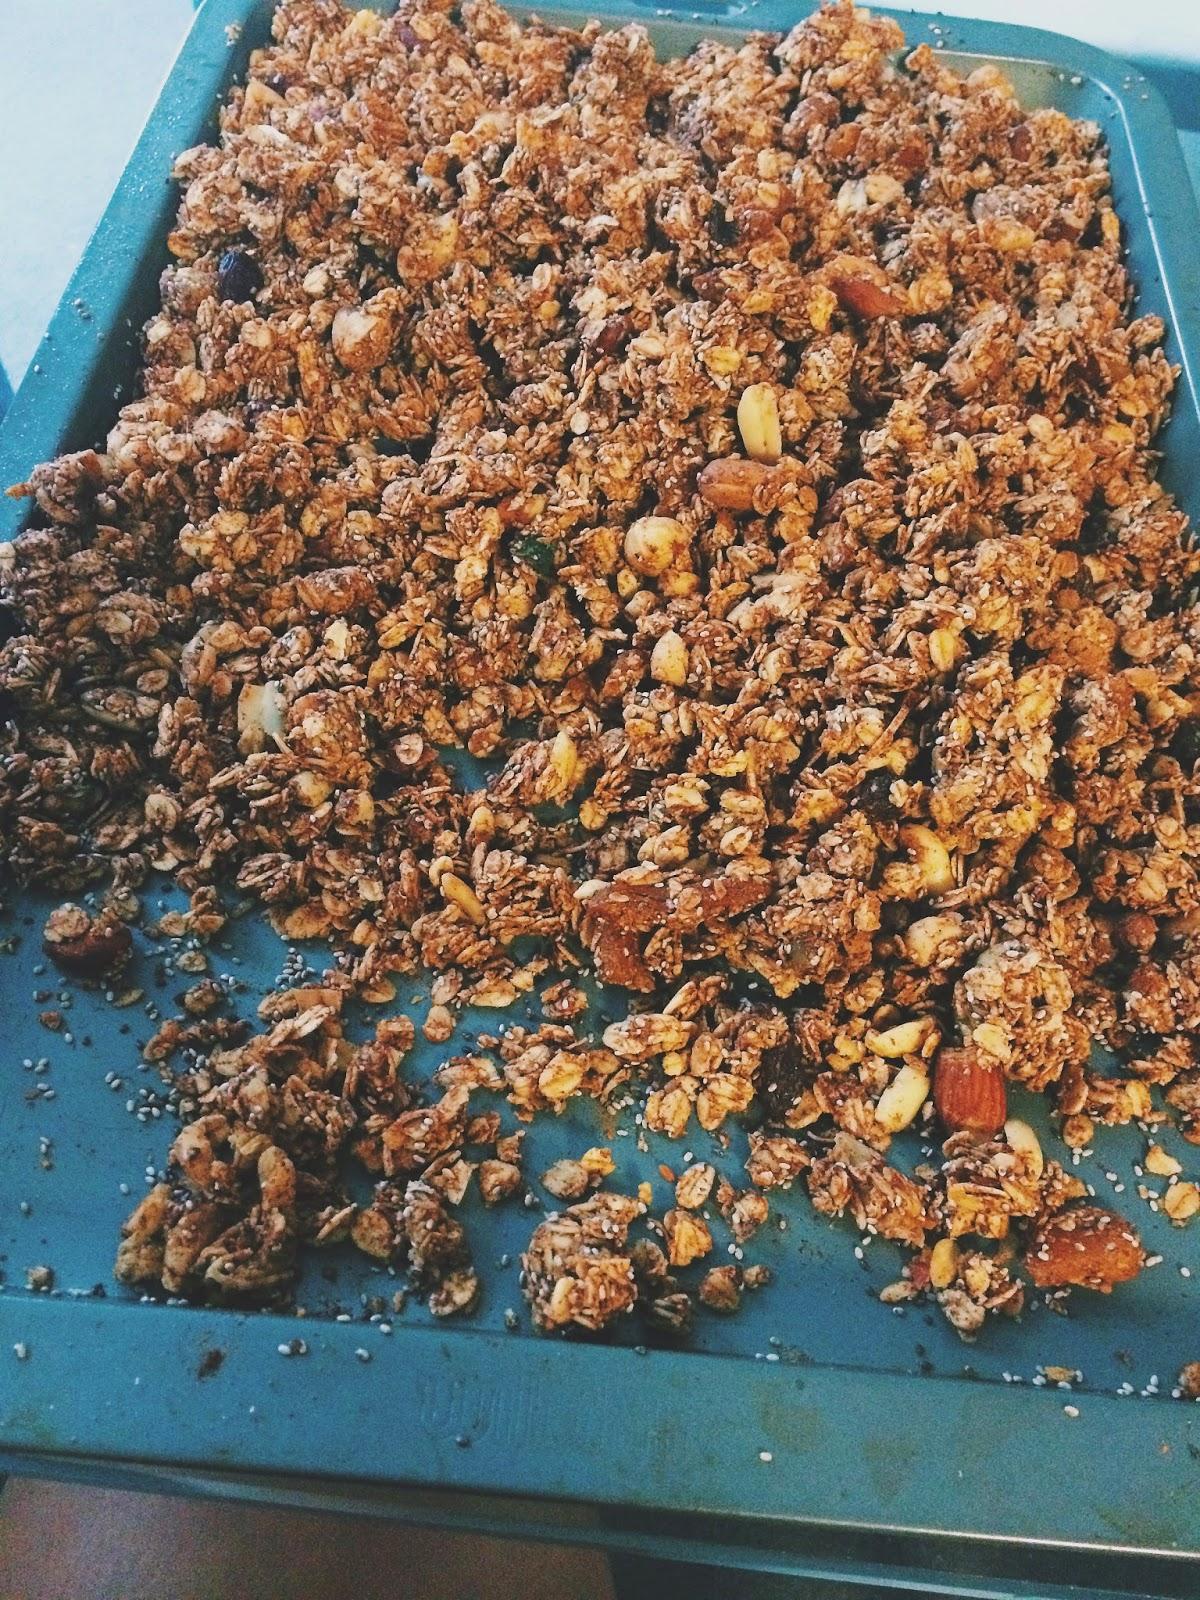 Homemade Cinnamon Granola Clusters